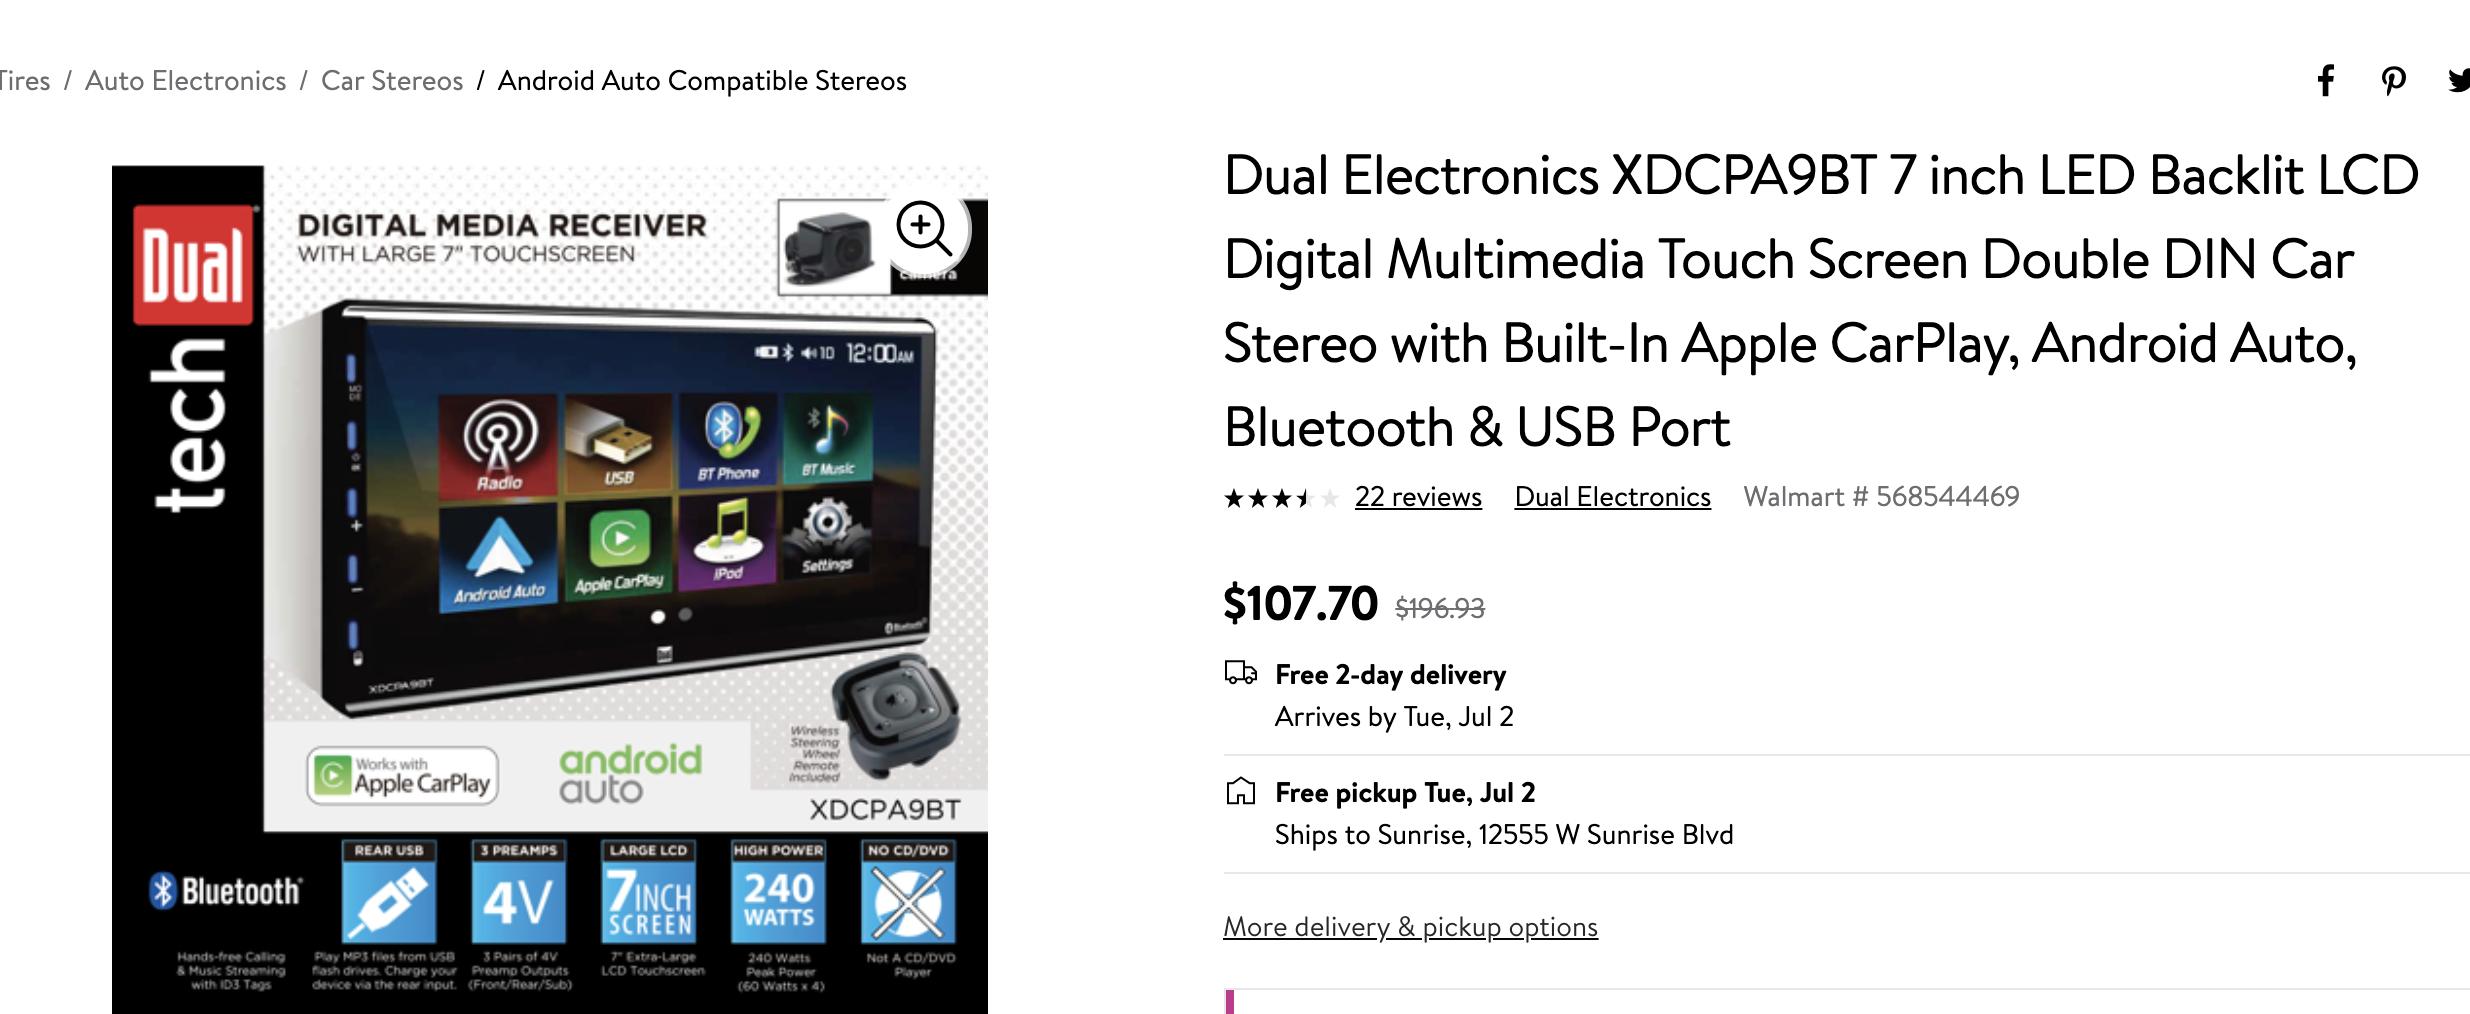 Dual Electronics Xdcpa9bt 7 Inch Led Backlit Lcd Digital Multimedia